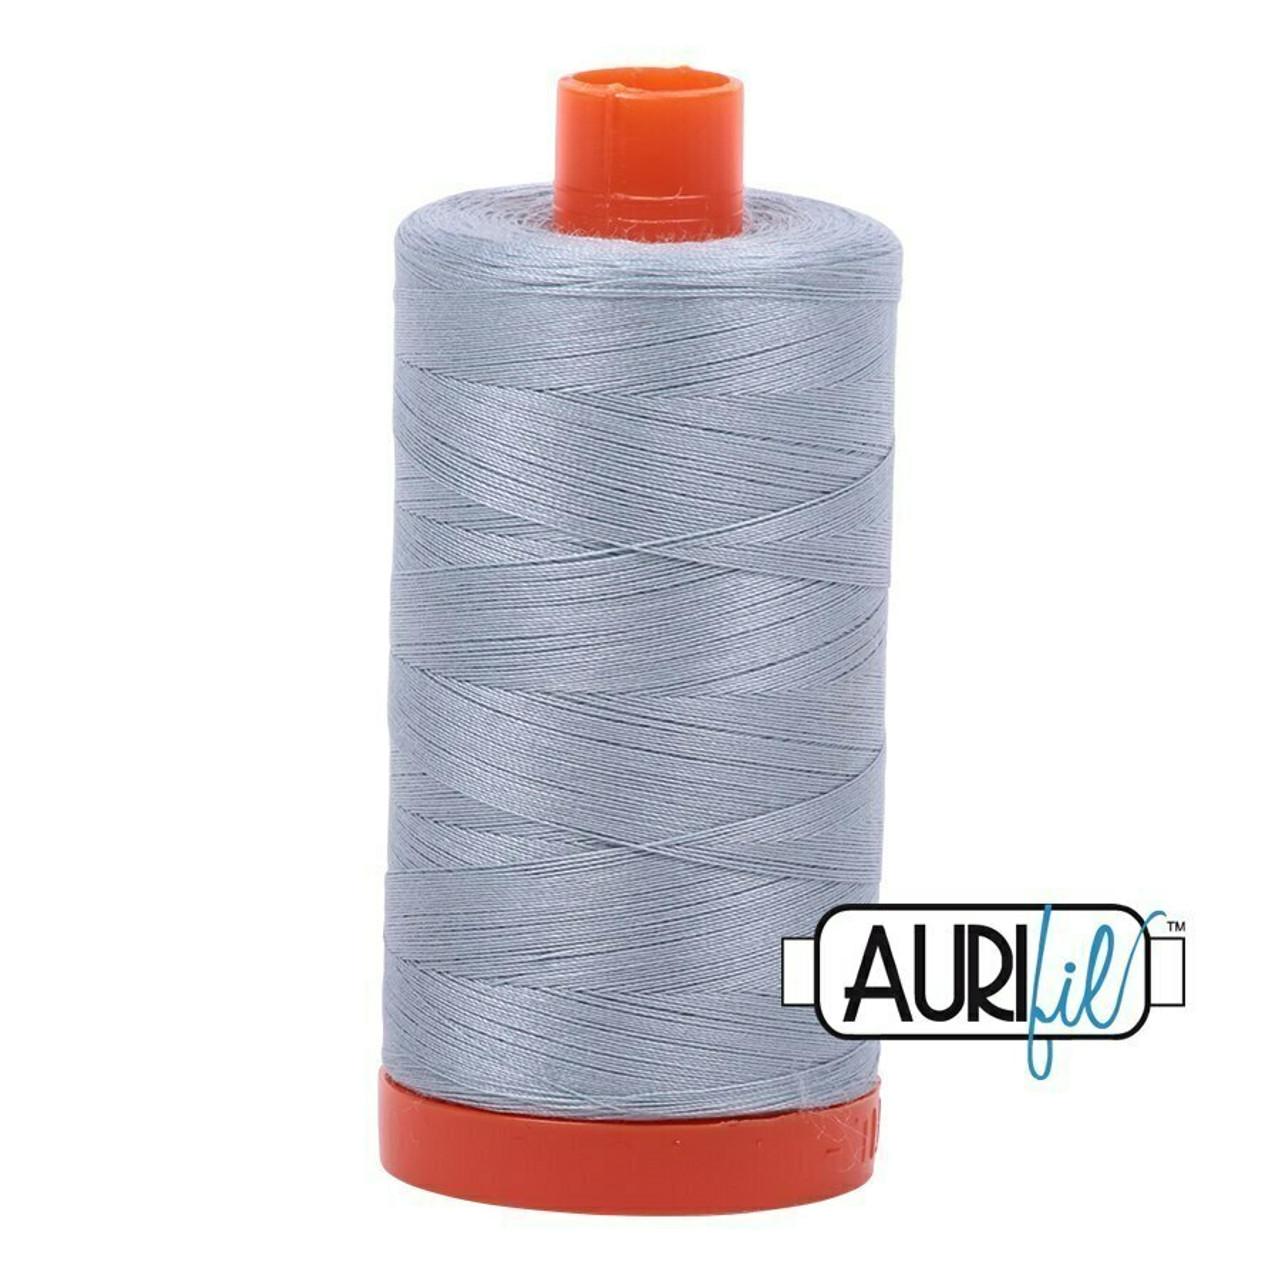 Aurifil 50wt Artic Sky (2612) thread